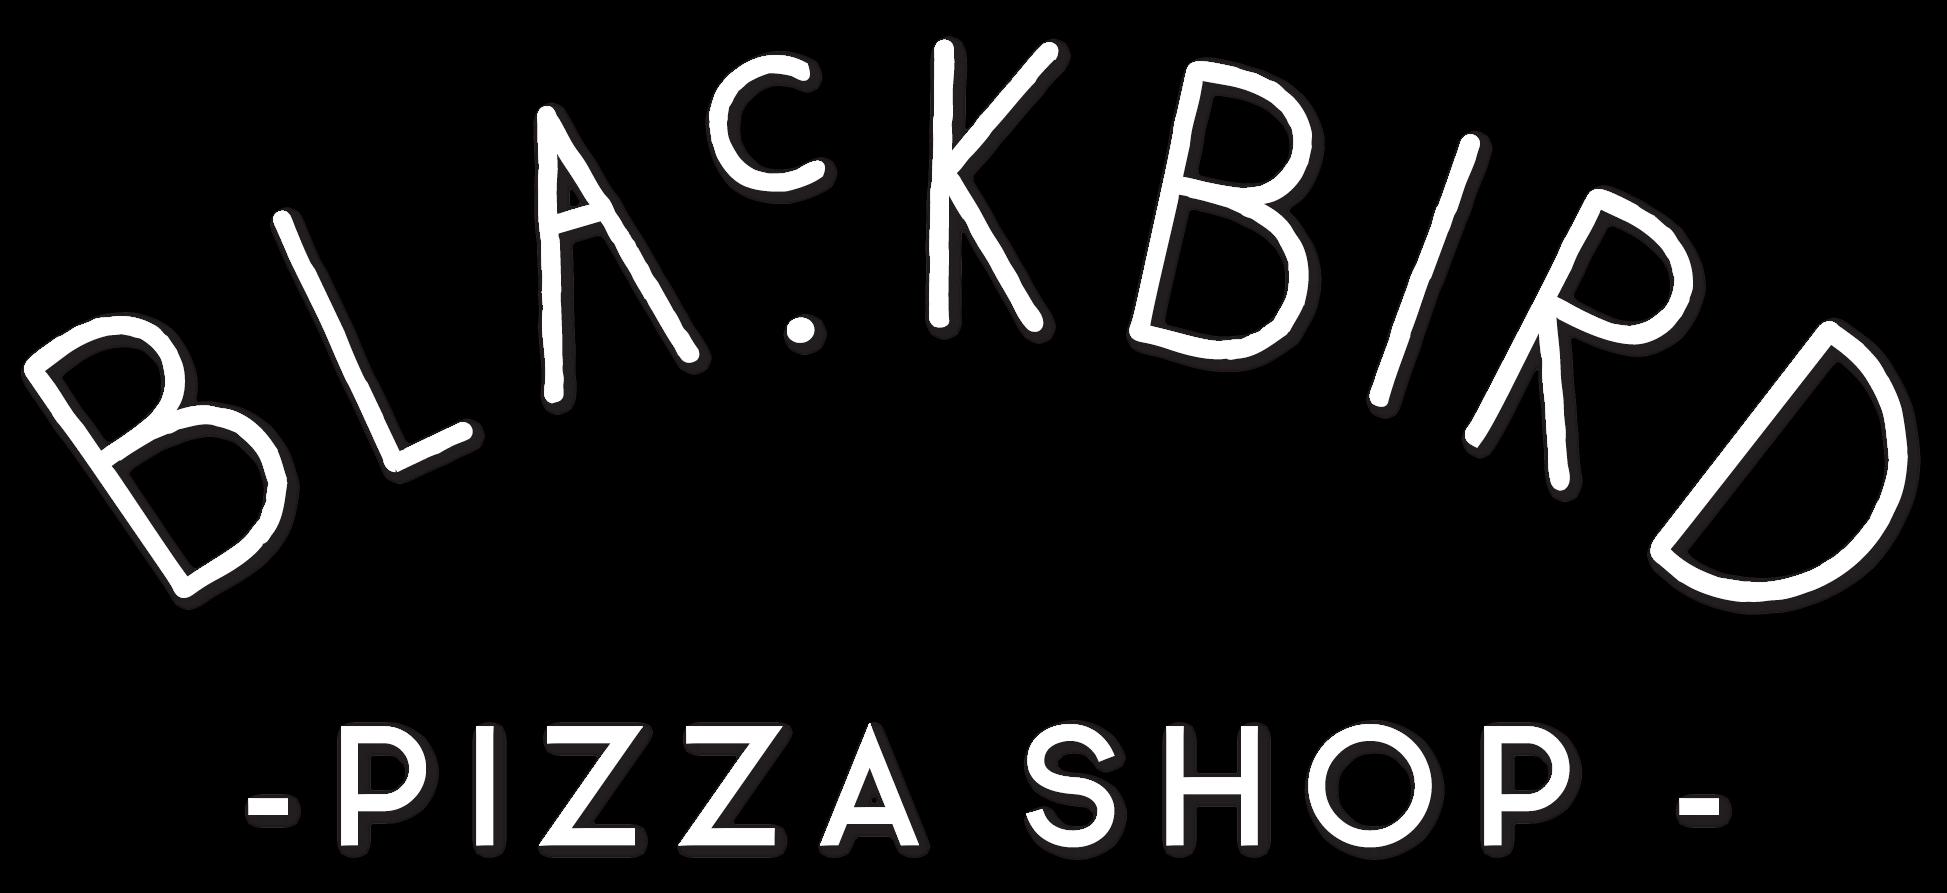 Blackbird – Pizza Shop